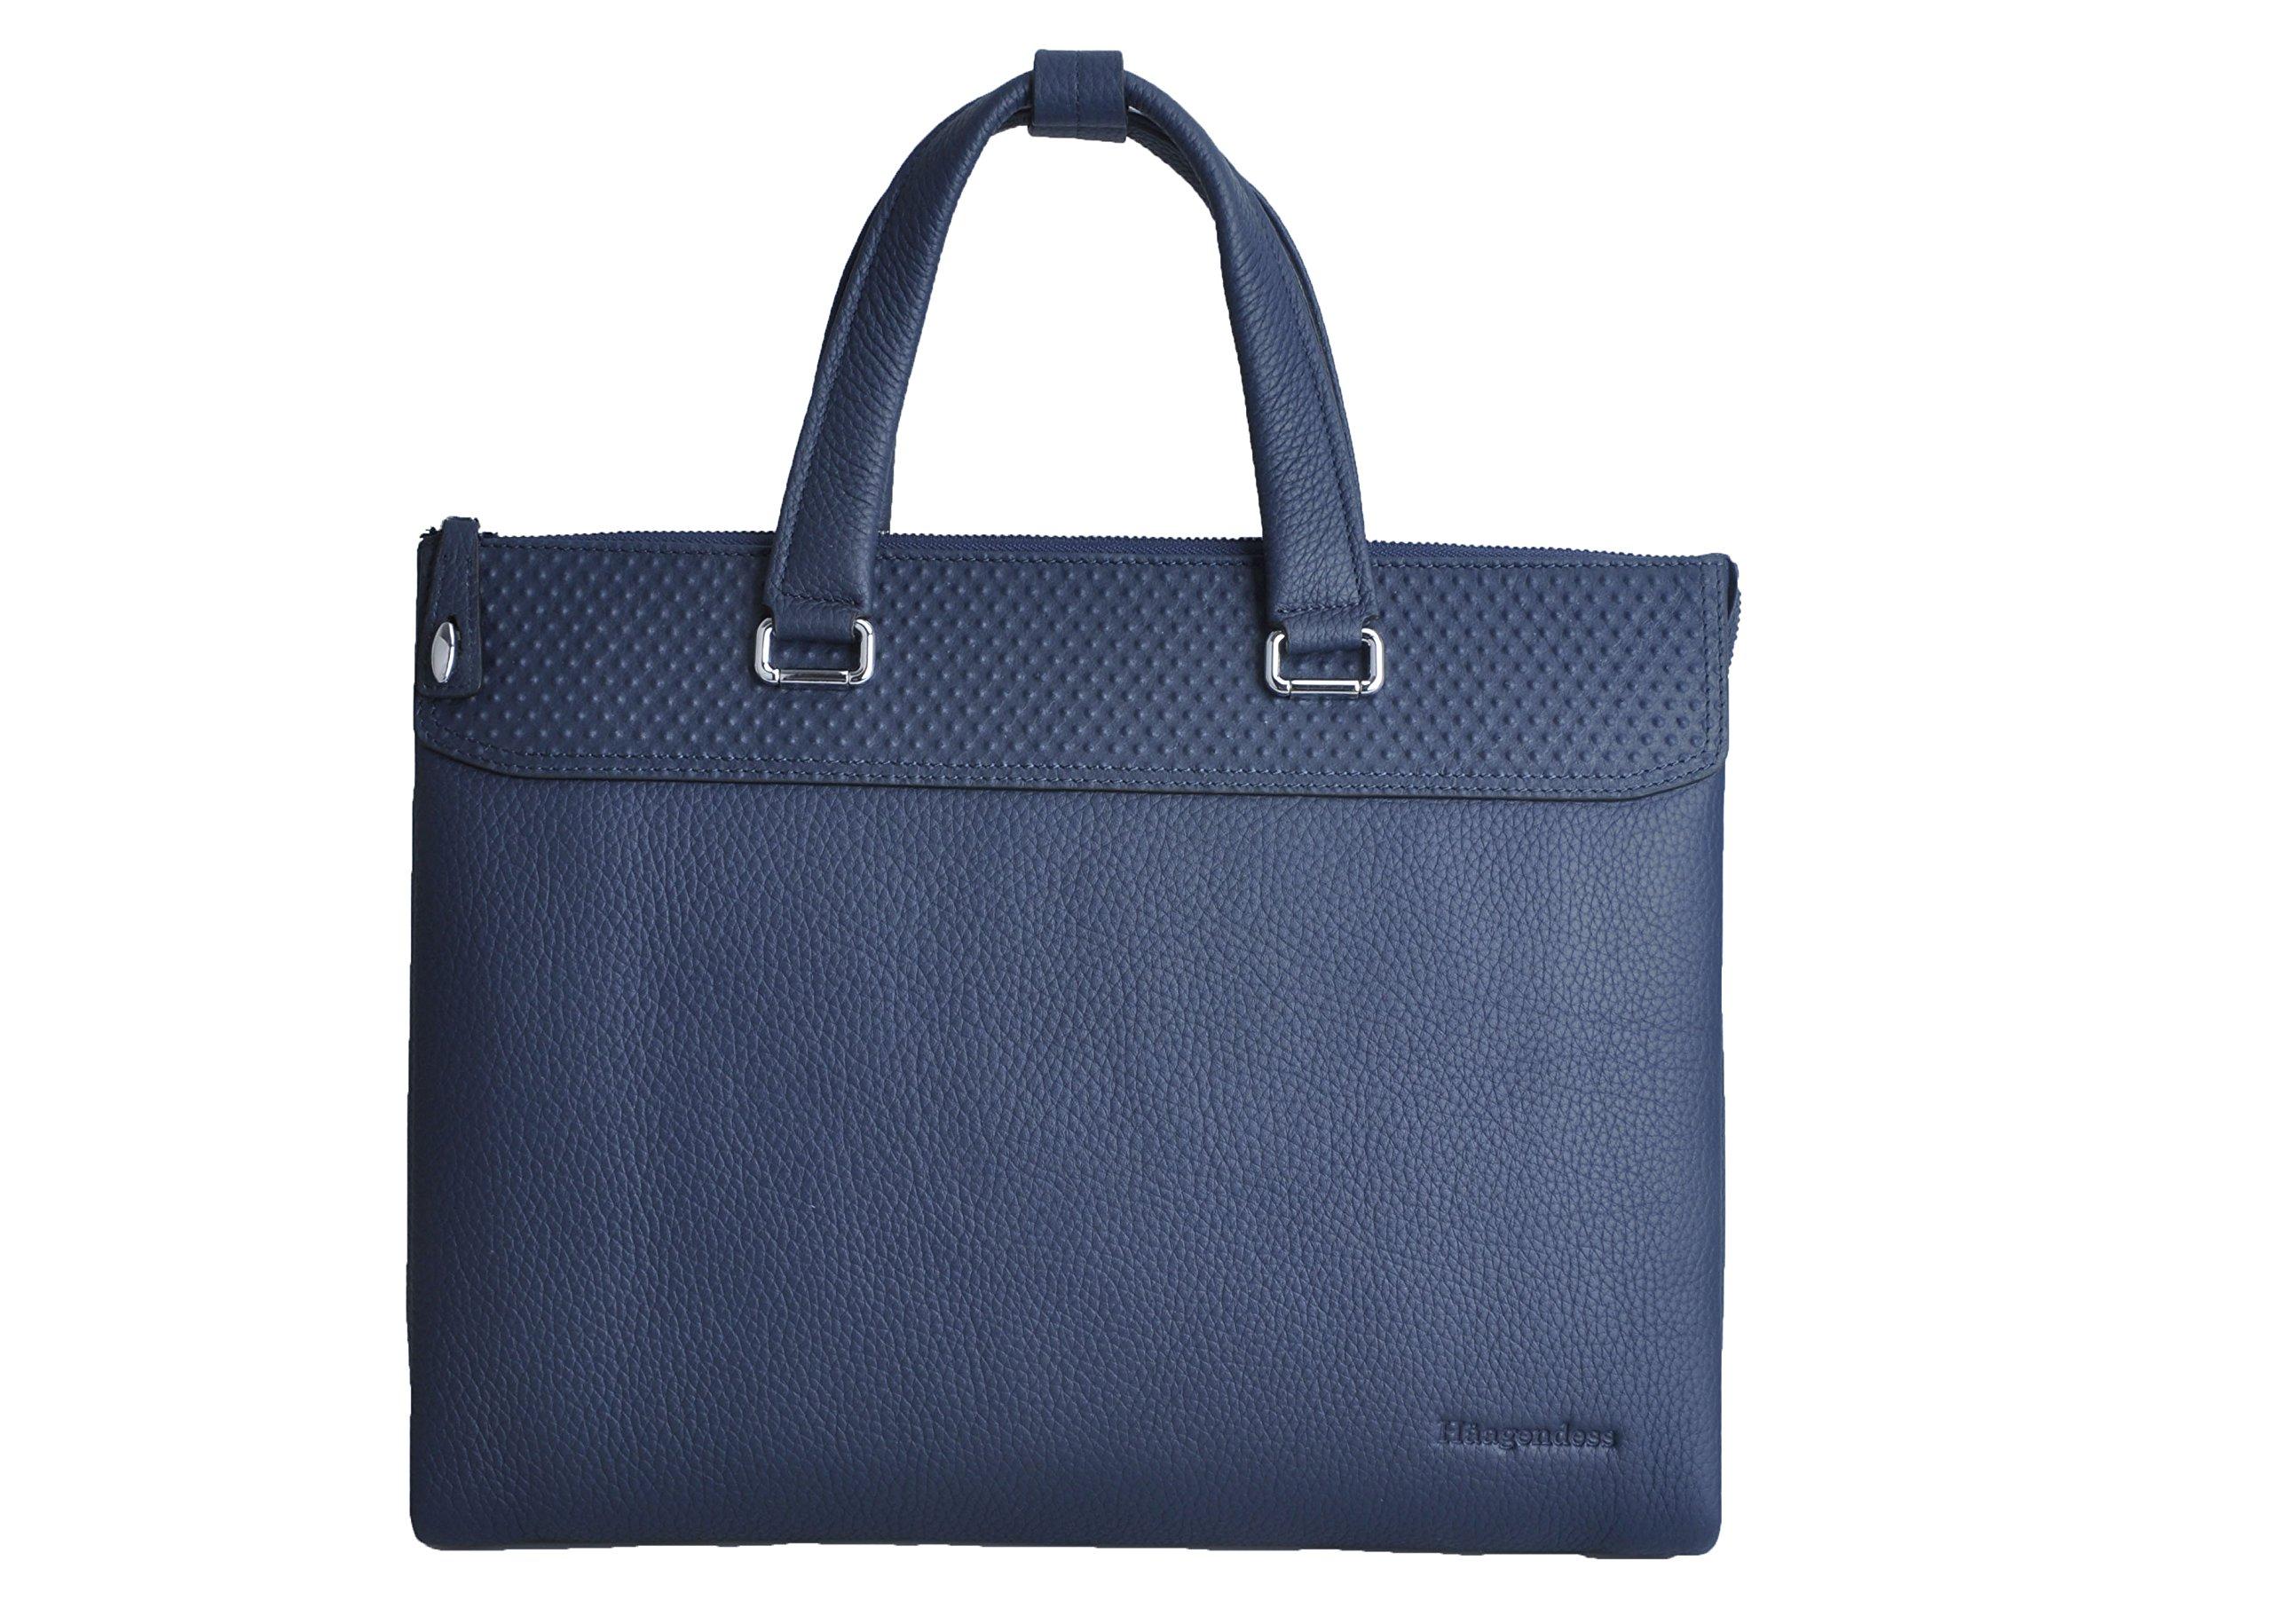 Haagendess Business Mens Bag Leather Laptop Briefcase Hand Bag (Blue)